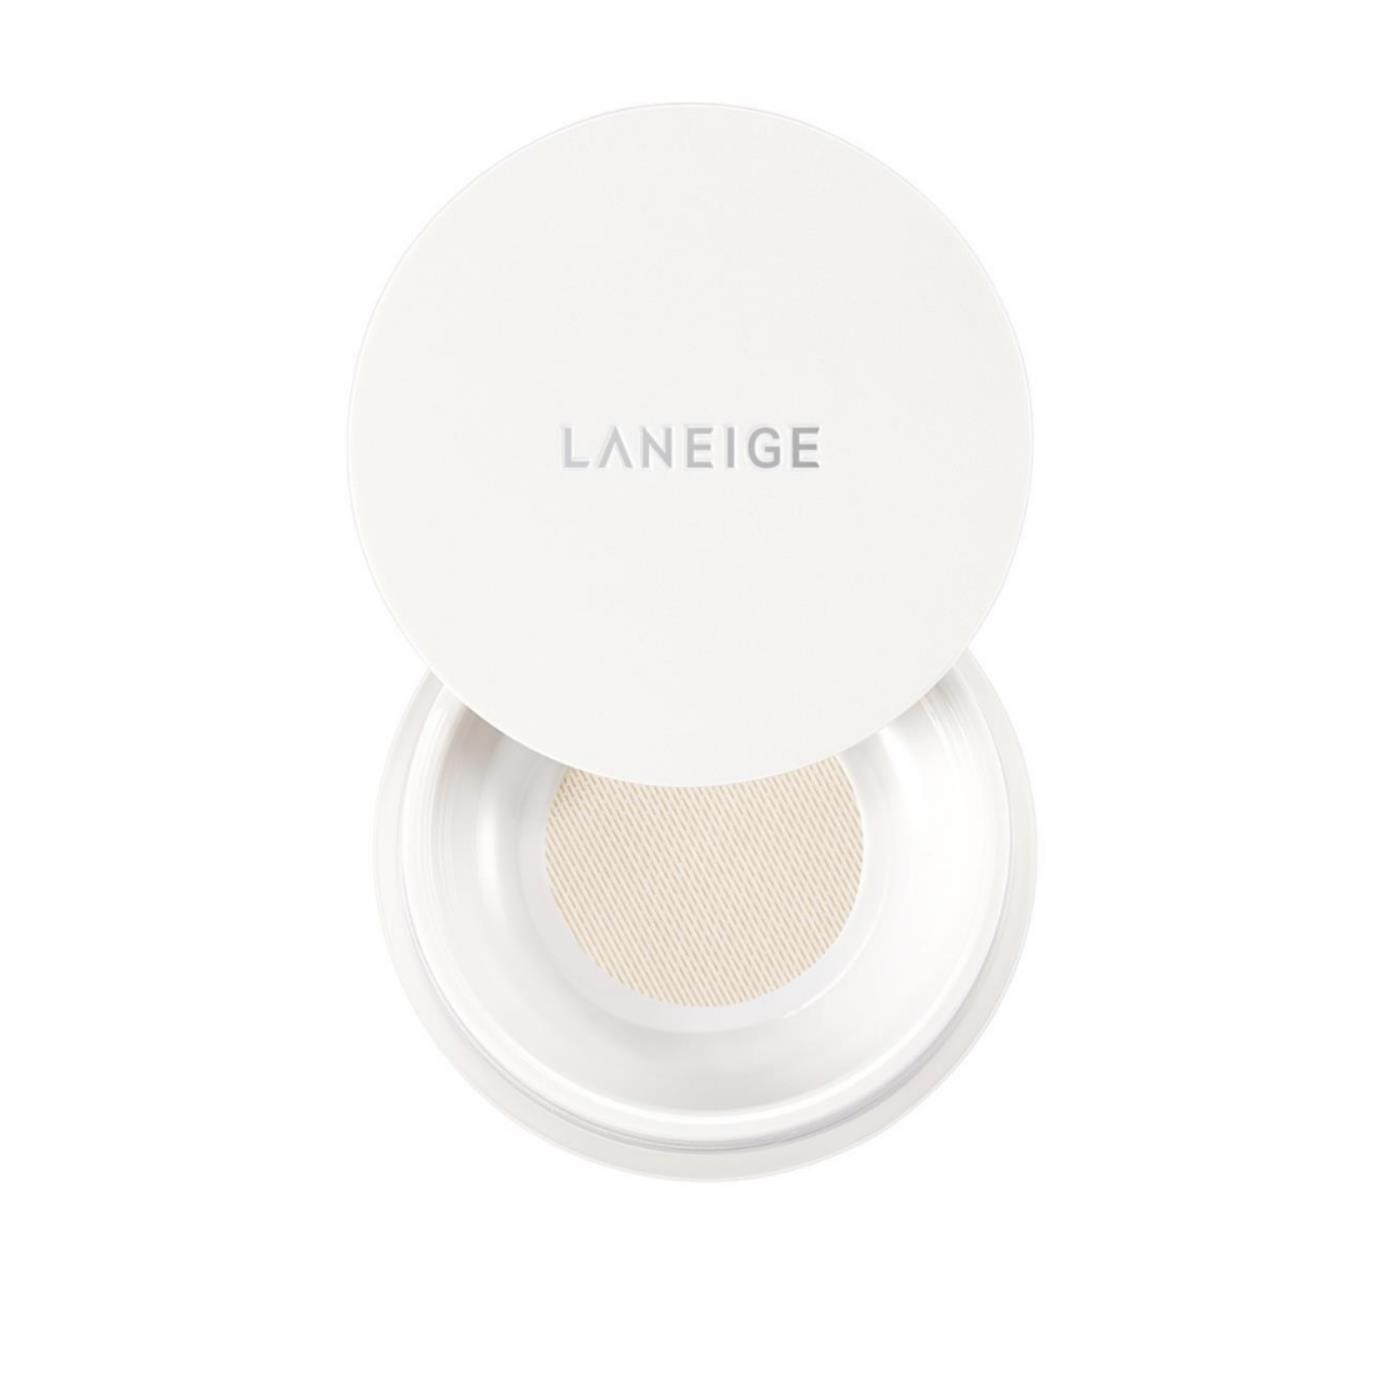 LANEIGE - Light Fit Powder